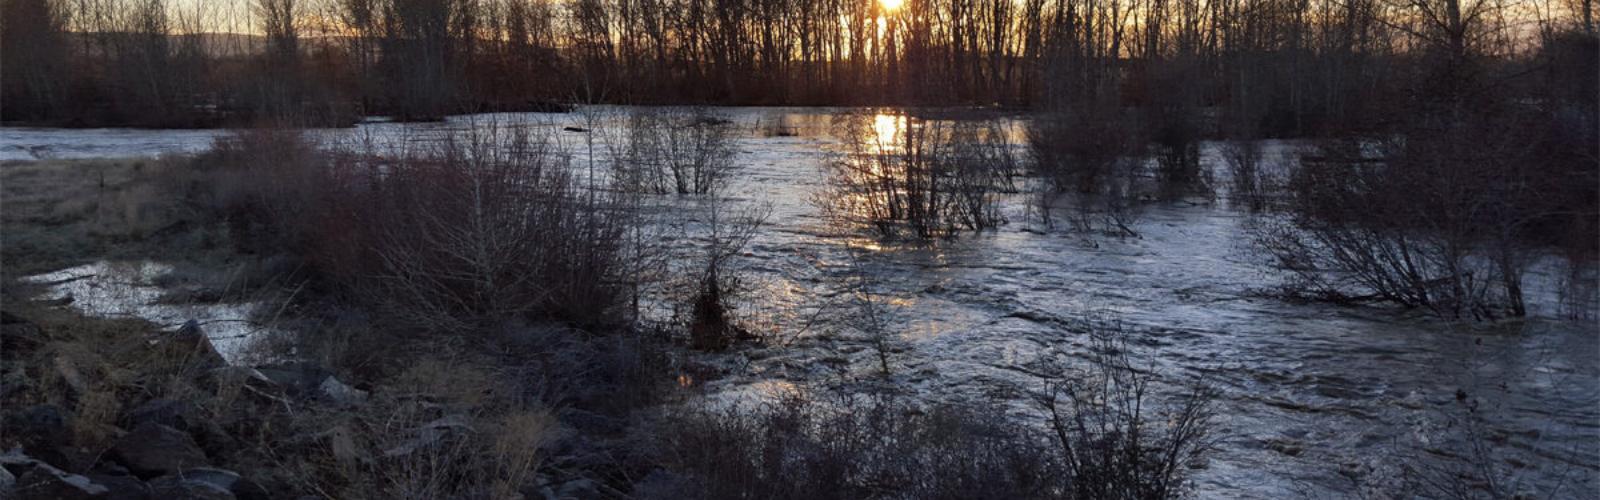 Floodplain restoration efforts by Yakima County on the Yakima River   Jonathan Loos